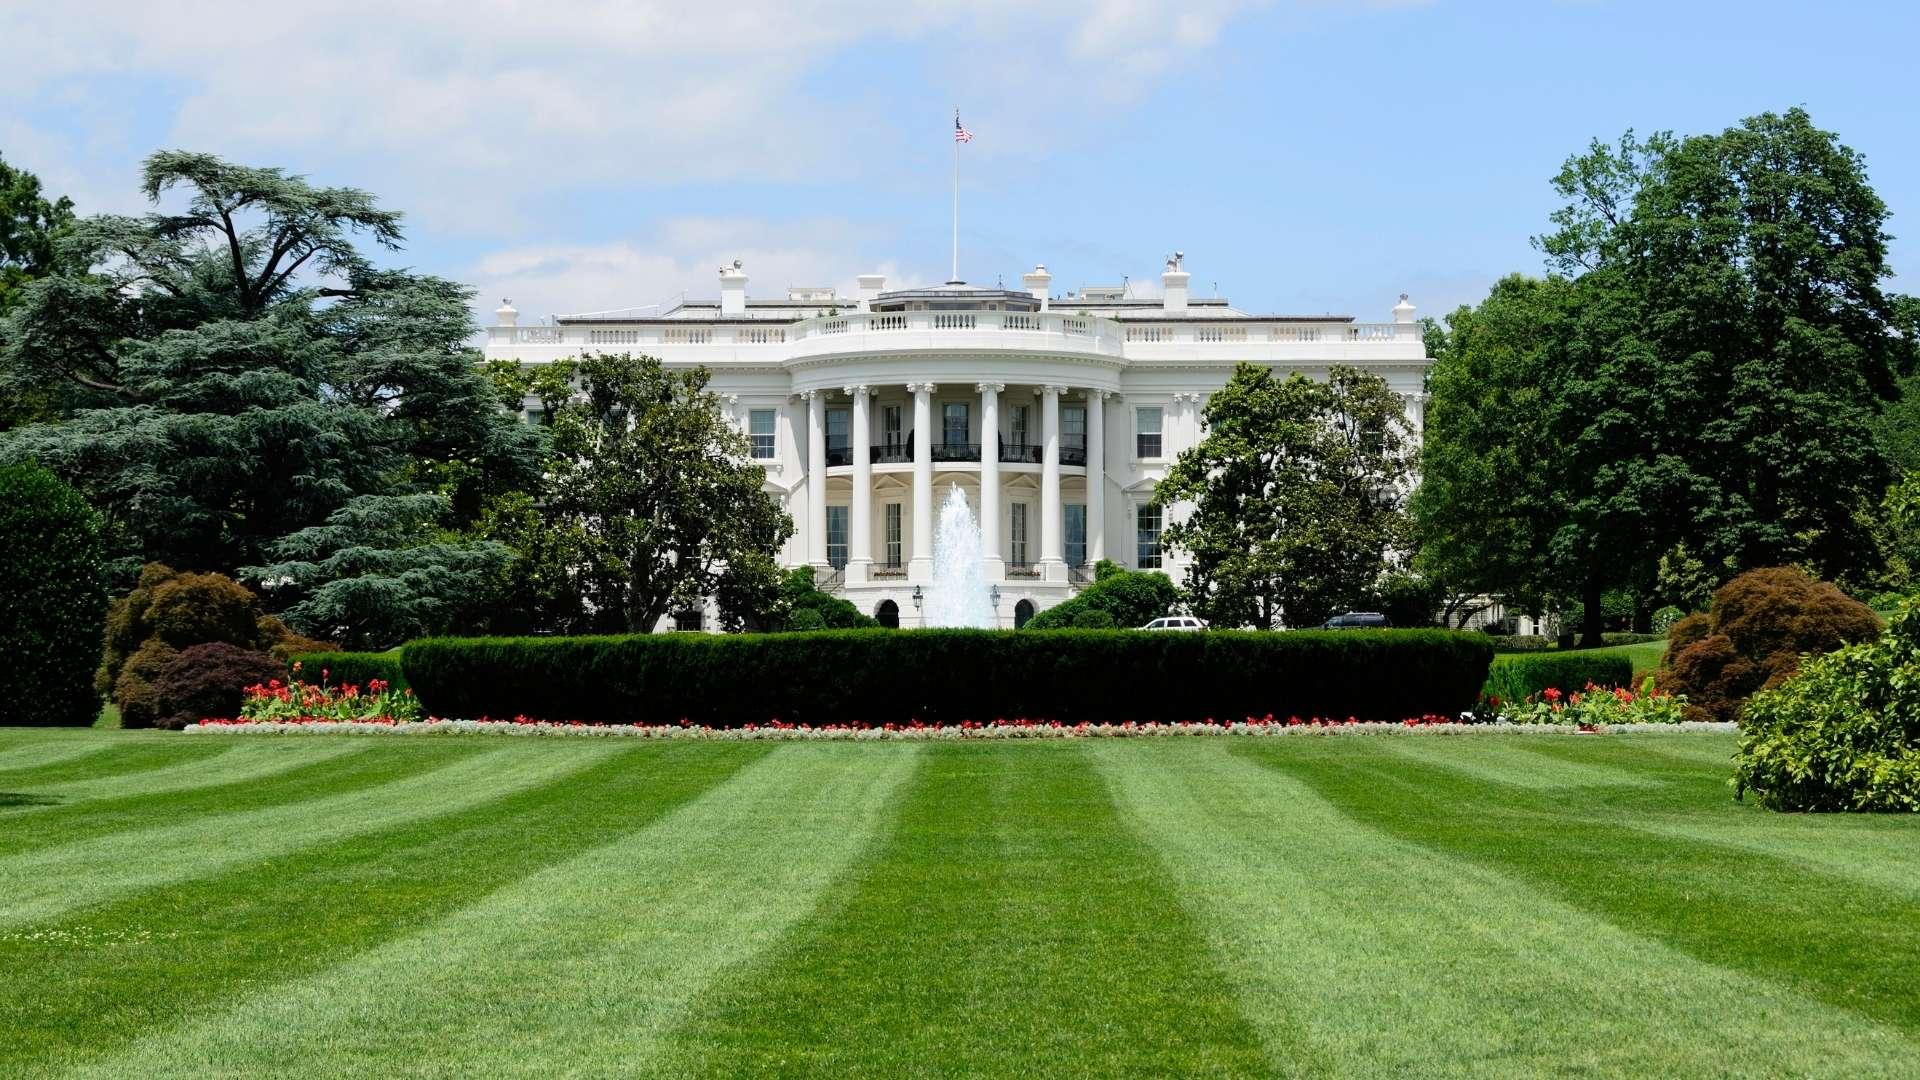 White_House_Washington_DC_1920x1080.jpg